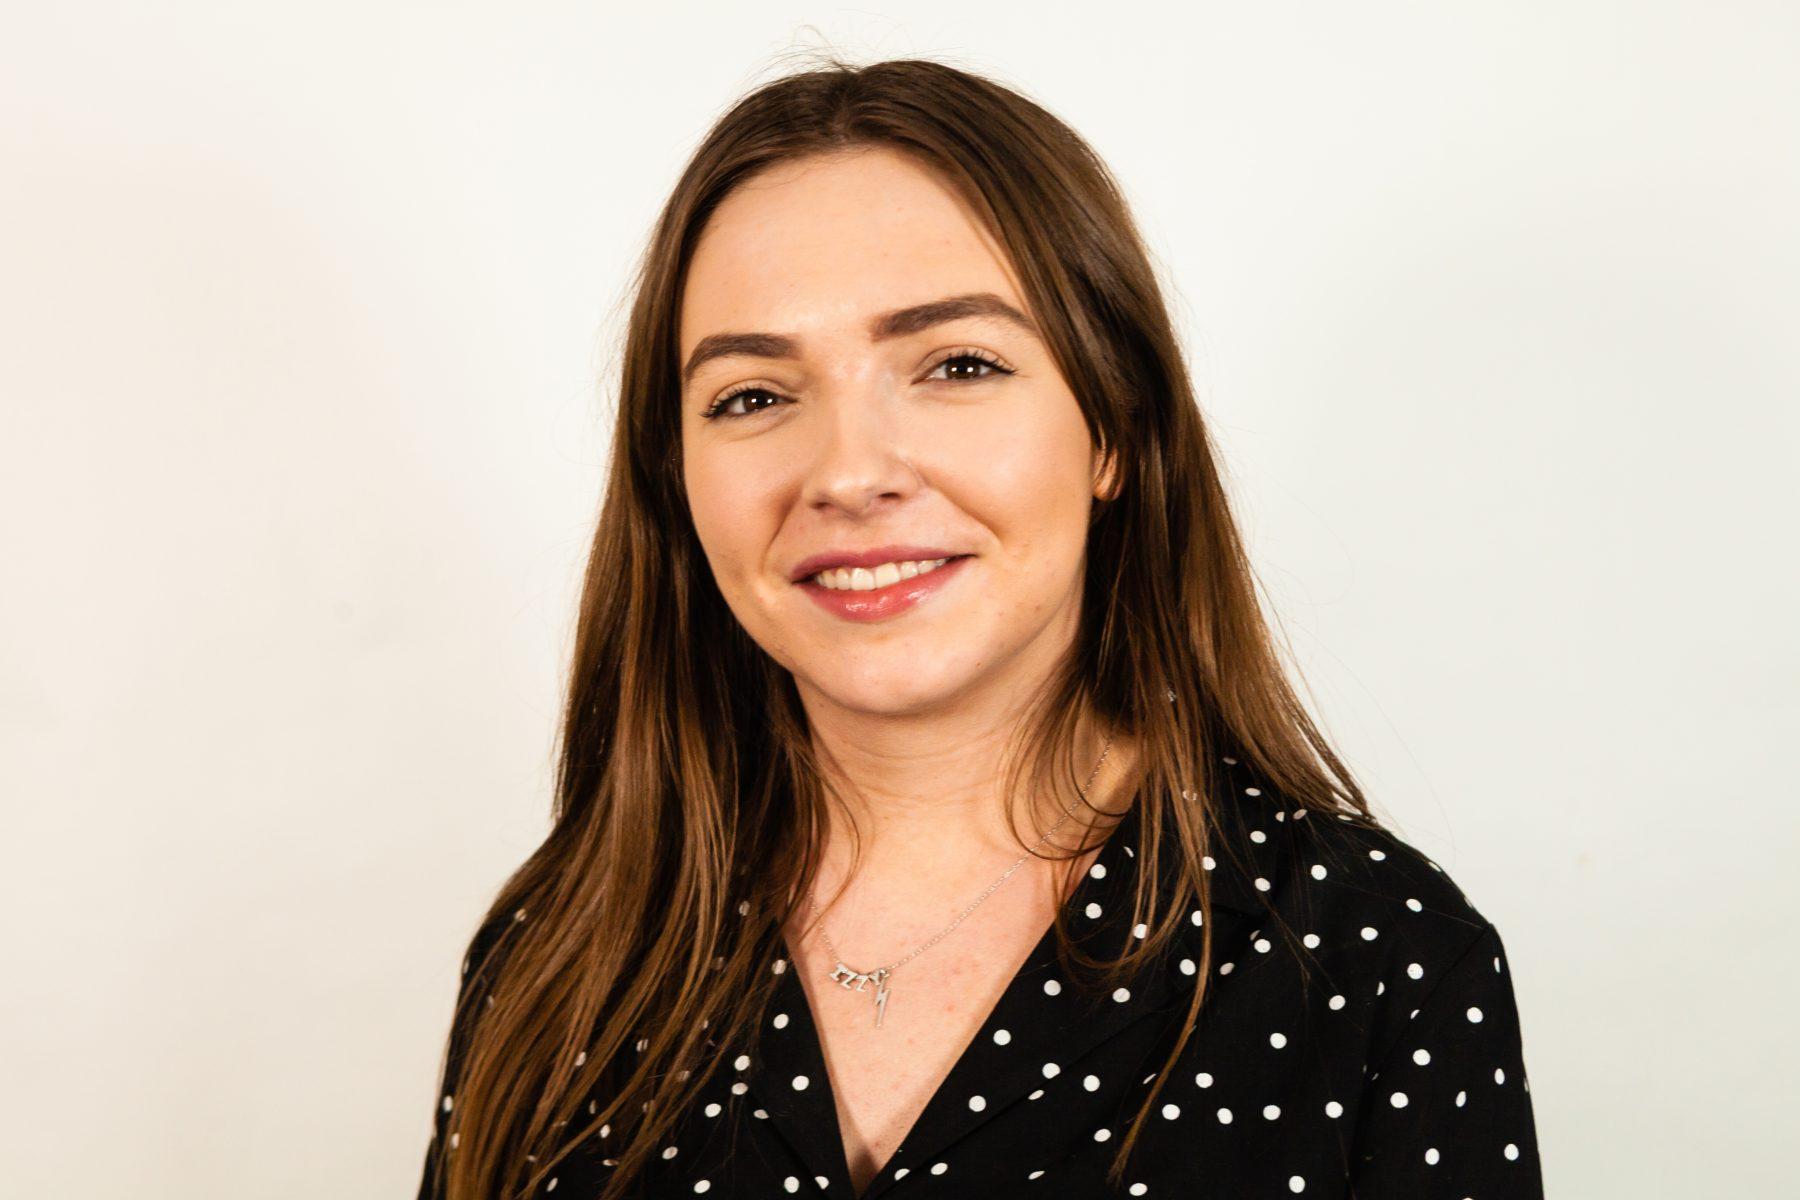 Izzy Stiven is a member of the award-winning PR team at Holyrood PR agency in Edinburgh, Scotland